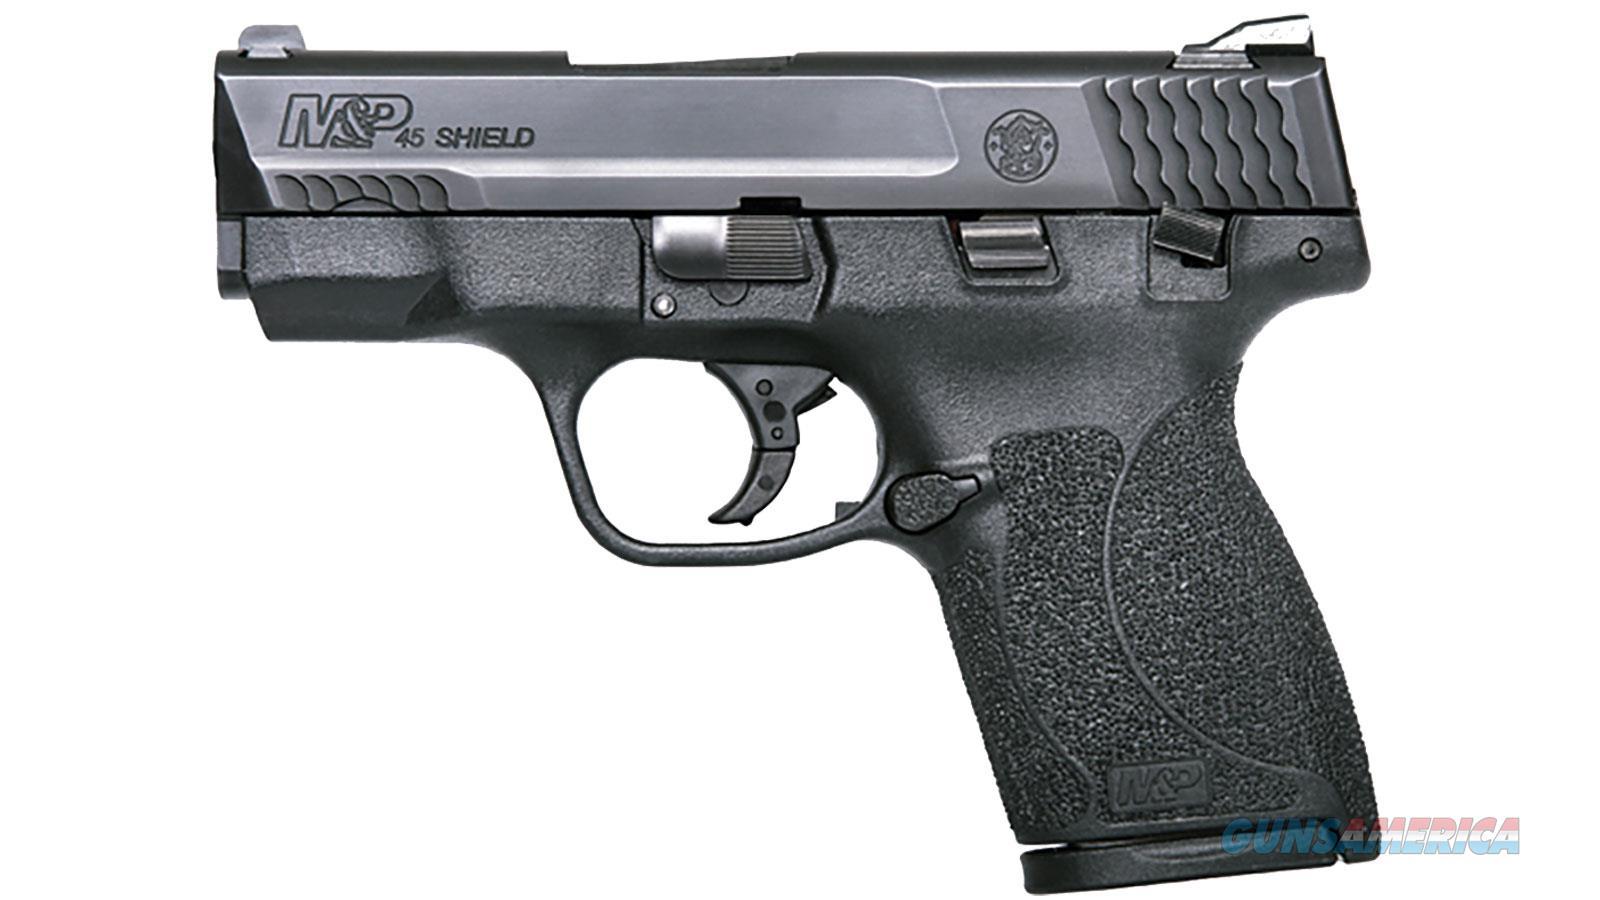 "Smith & Wesson M&P Shld M2.0 45Acp 3.3"" 11531  Guns > Pistols > S Misc Pistols"